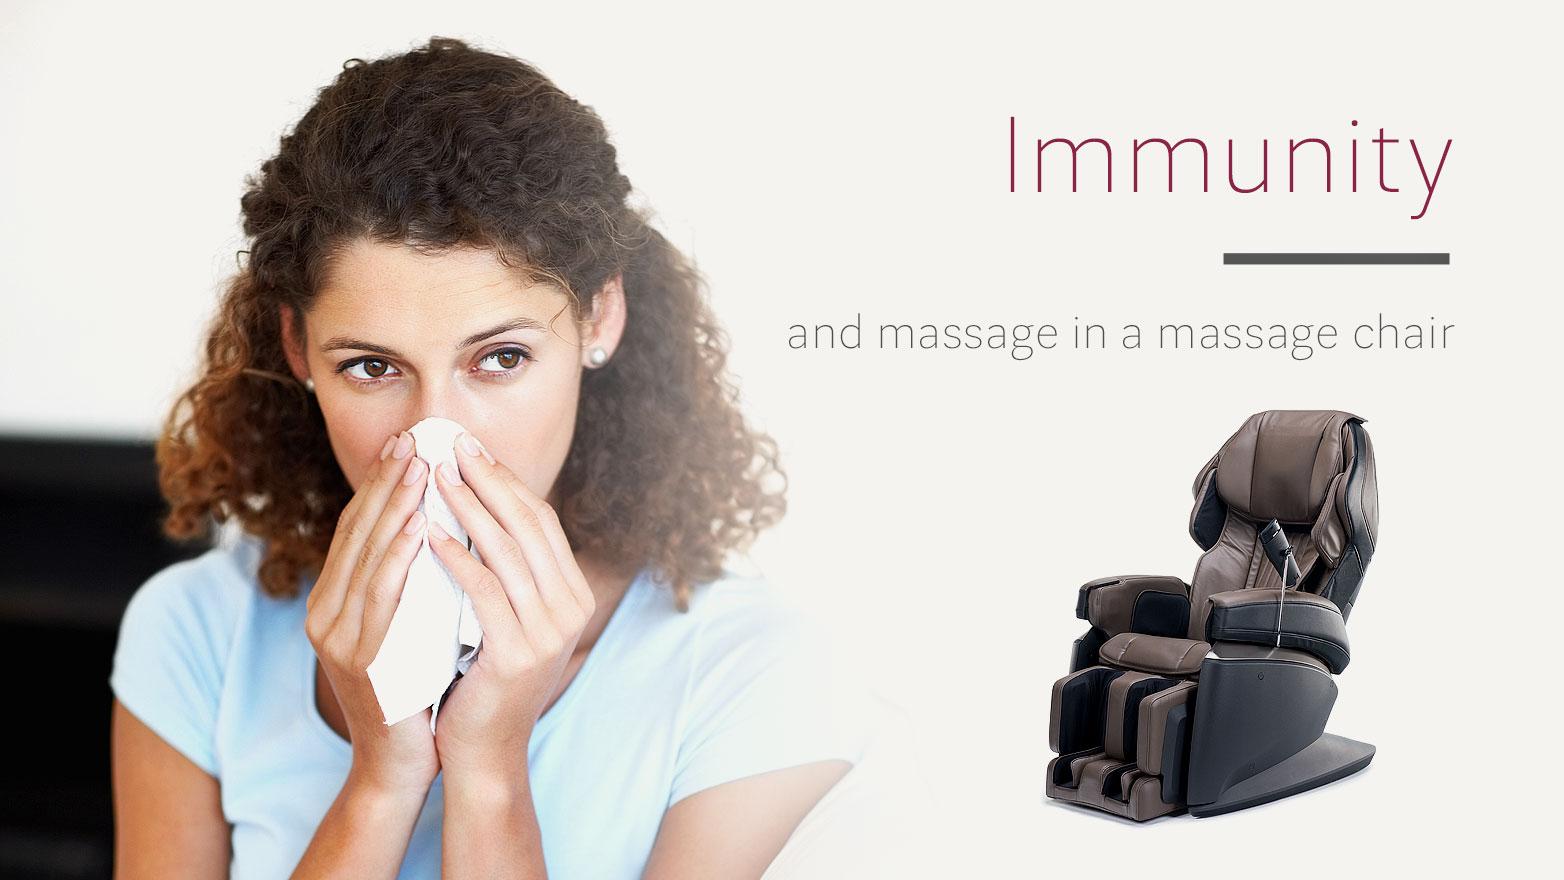 massage chairs and immunity